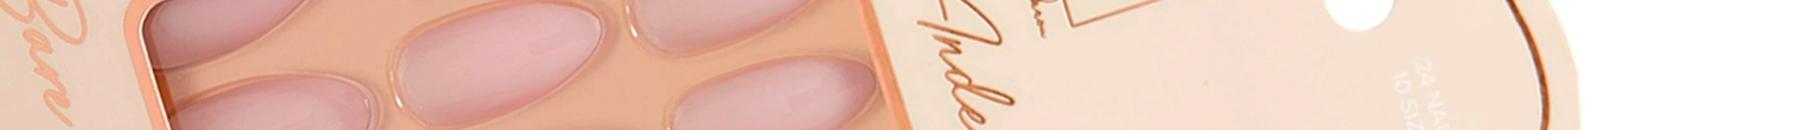 Glue-on nails